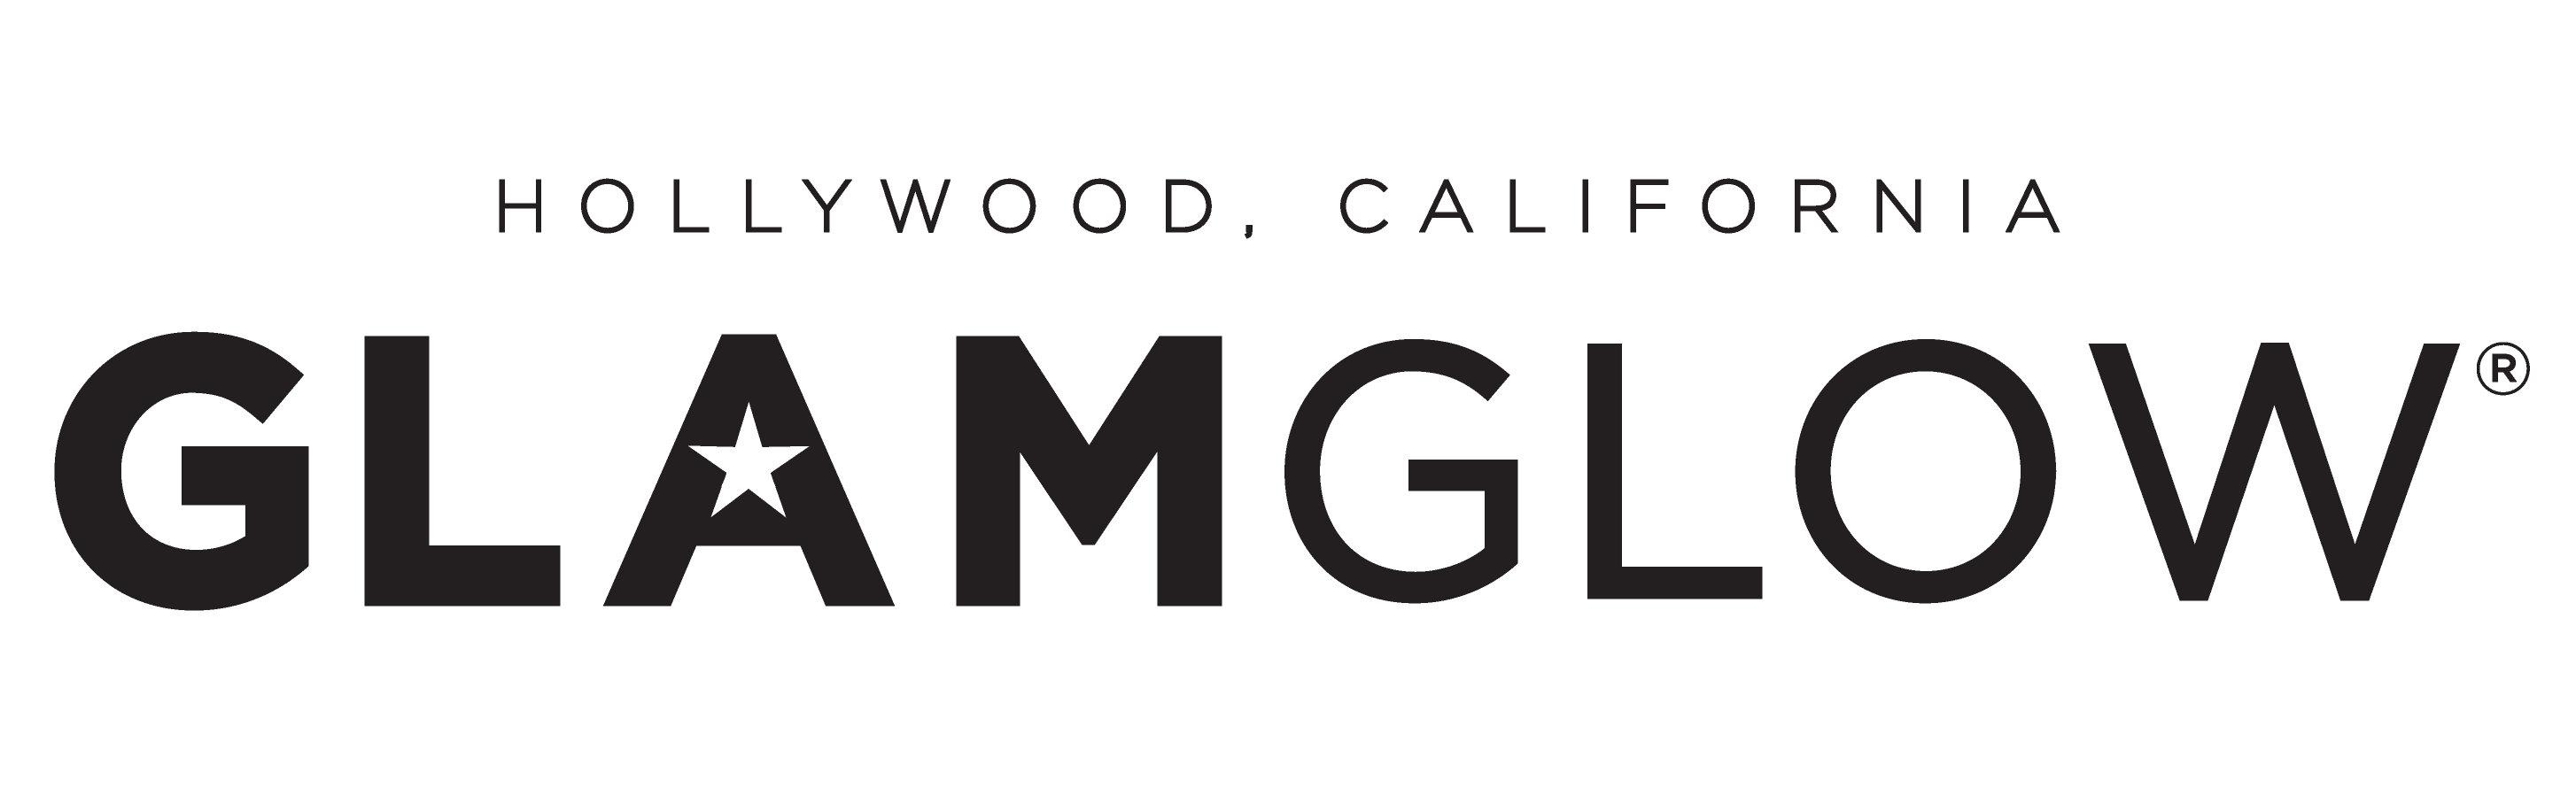 glamglow-logo.jpg